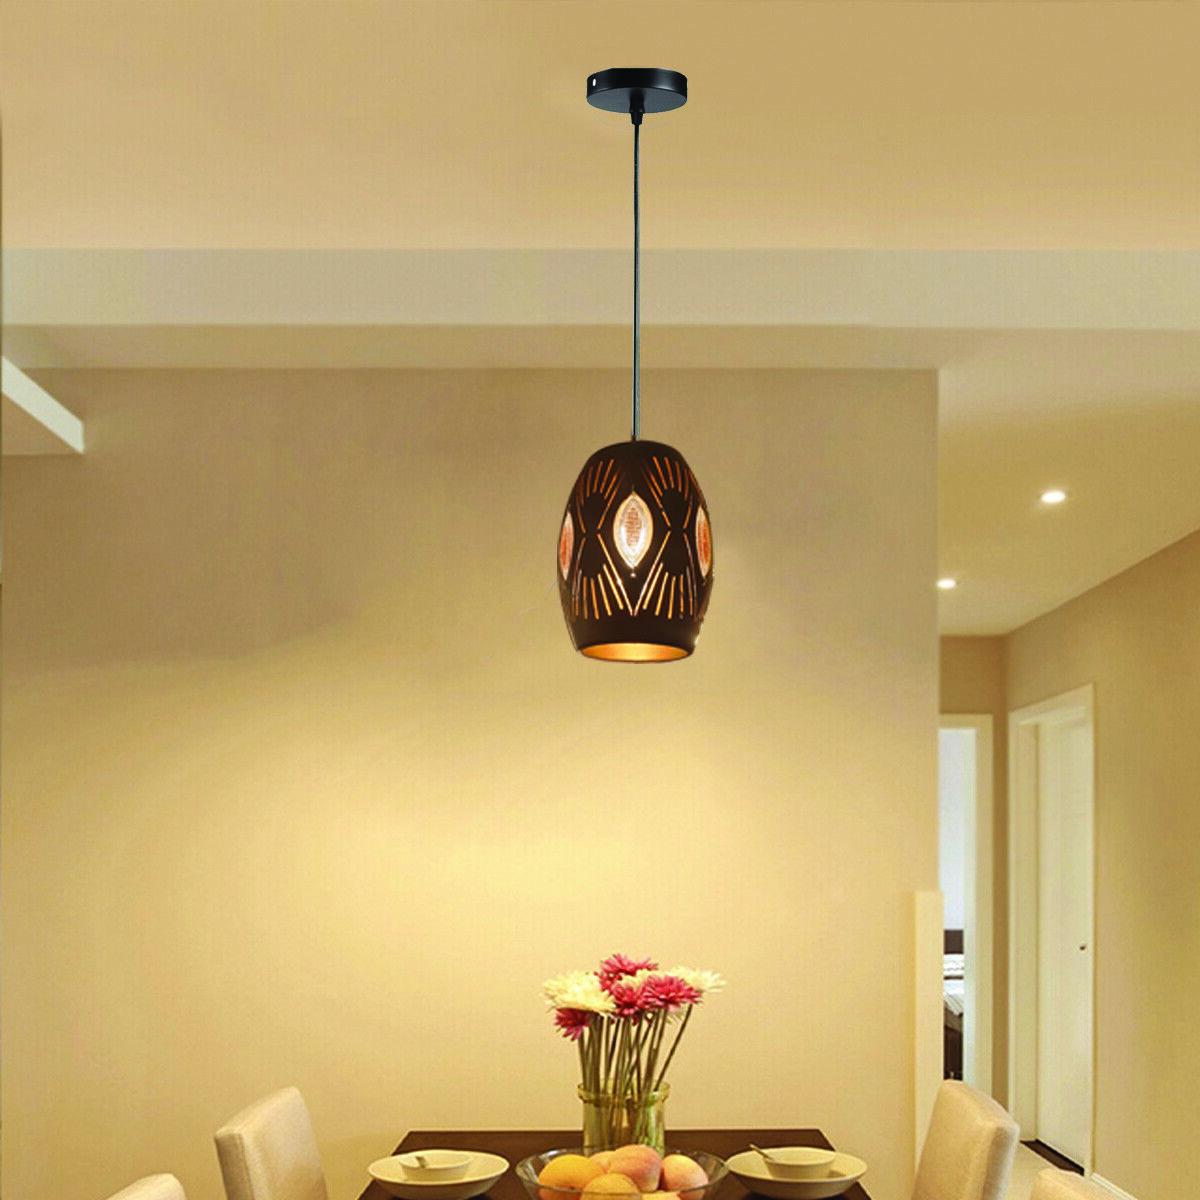 Vintage Industrial Metal Ceiling Pendant Light Shade Modern Hanging Retro Light Ebay